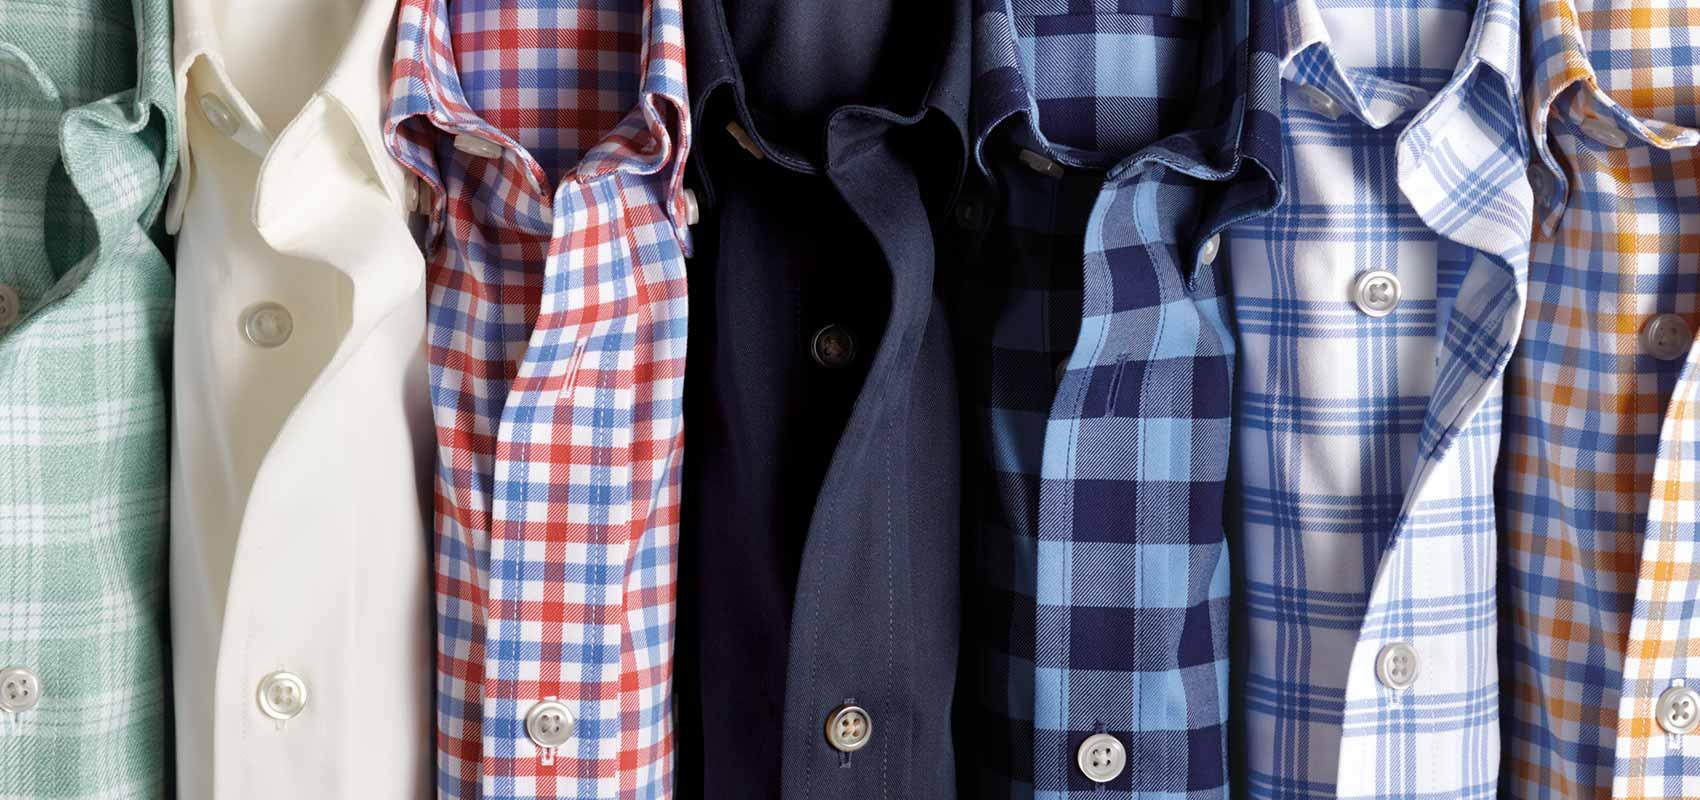 Twill weave shirts